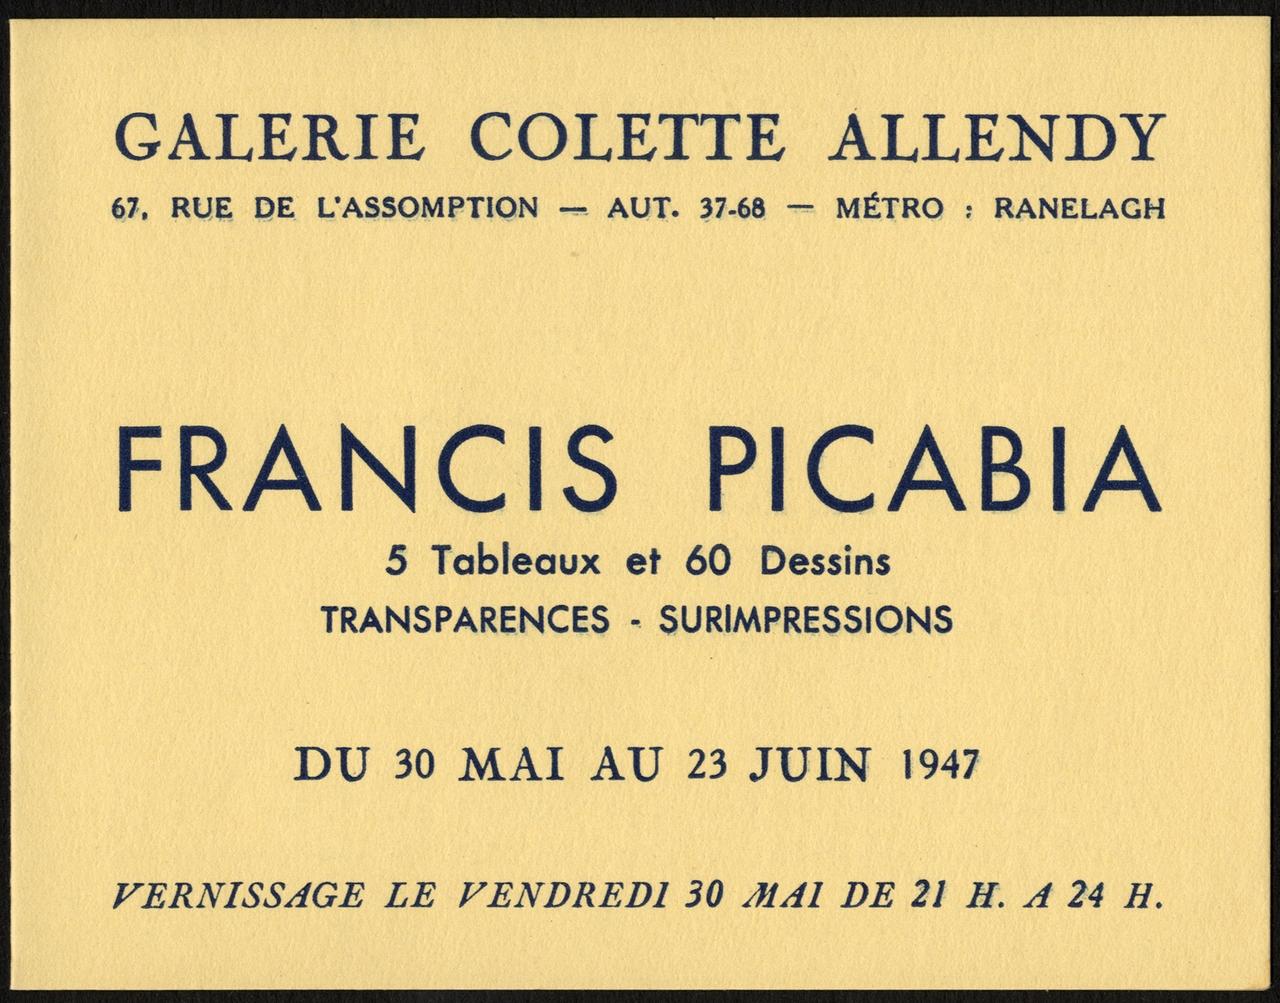 image for Galerie Colette Allendy